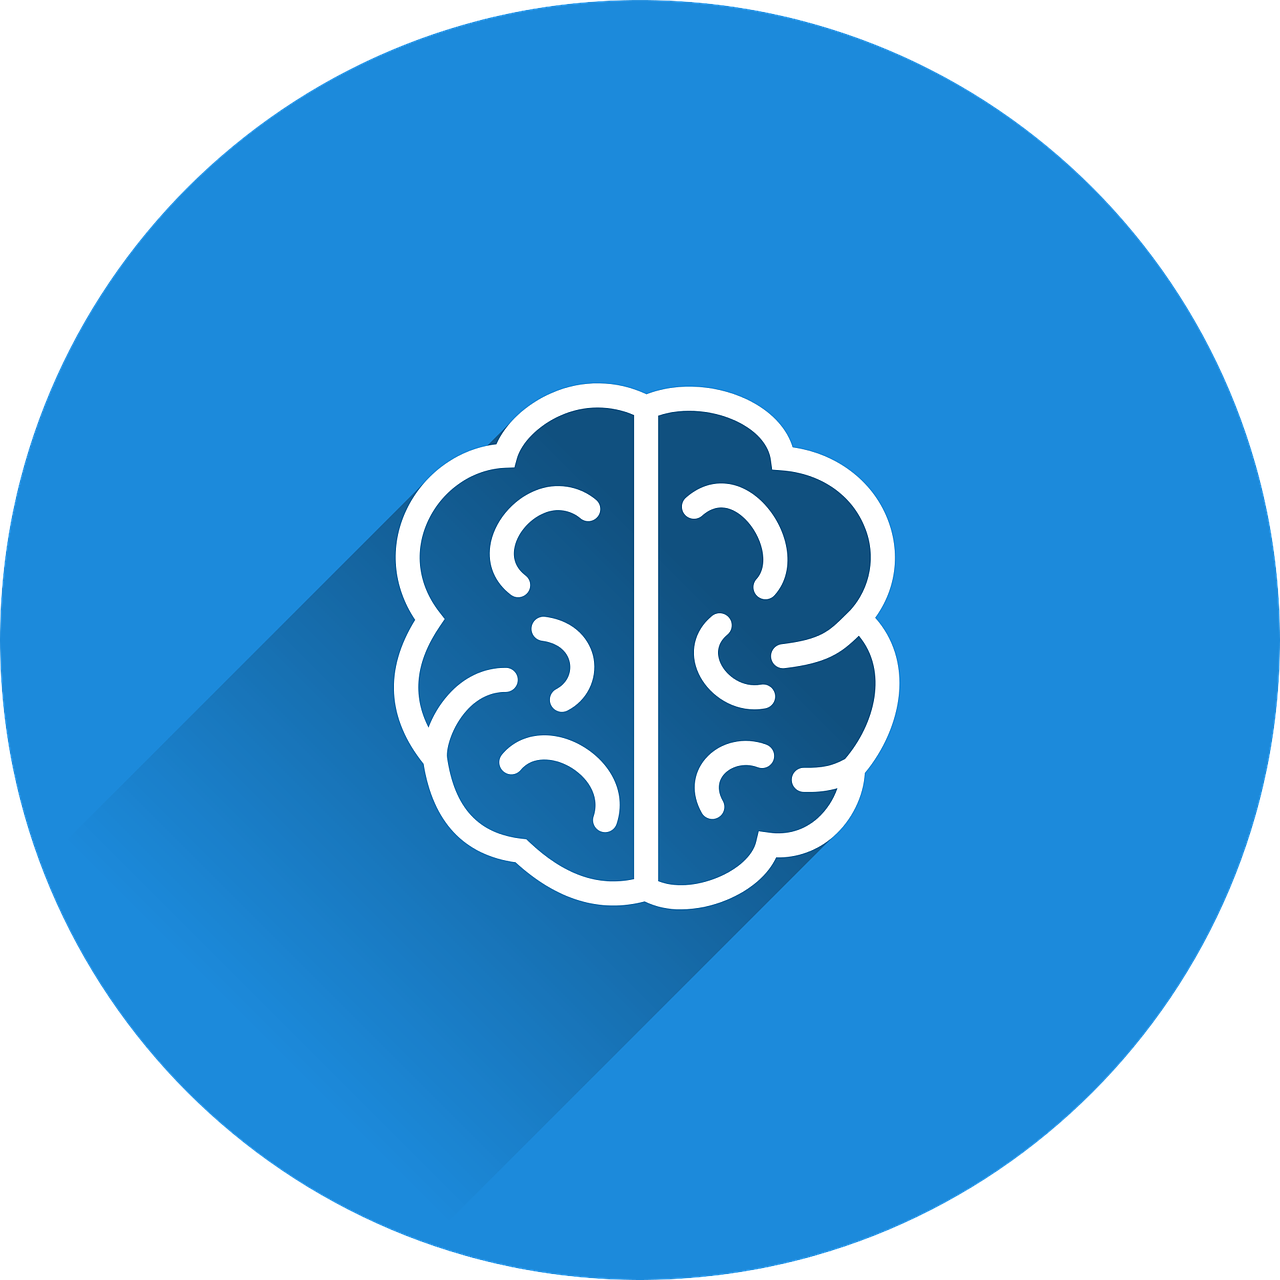 brain-2235771_1280.png